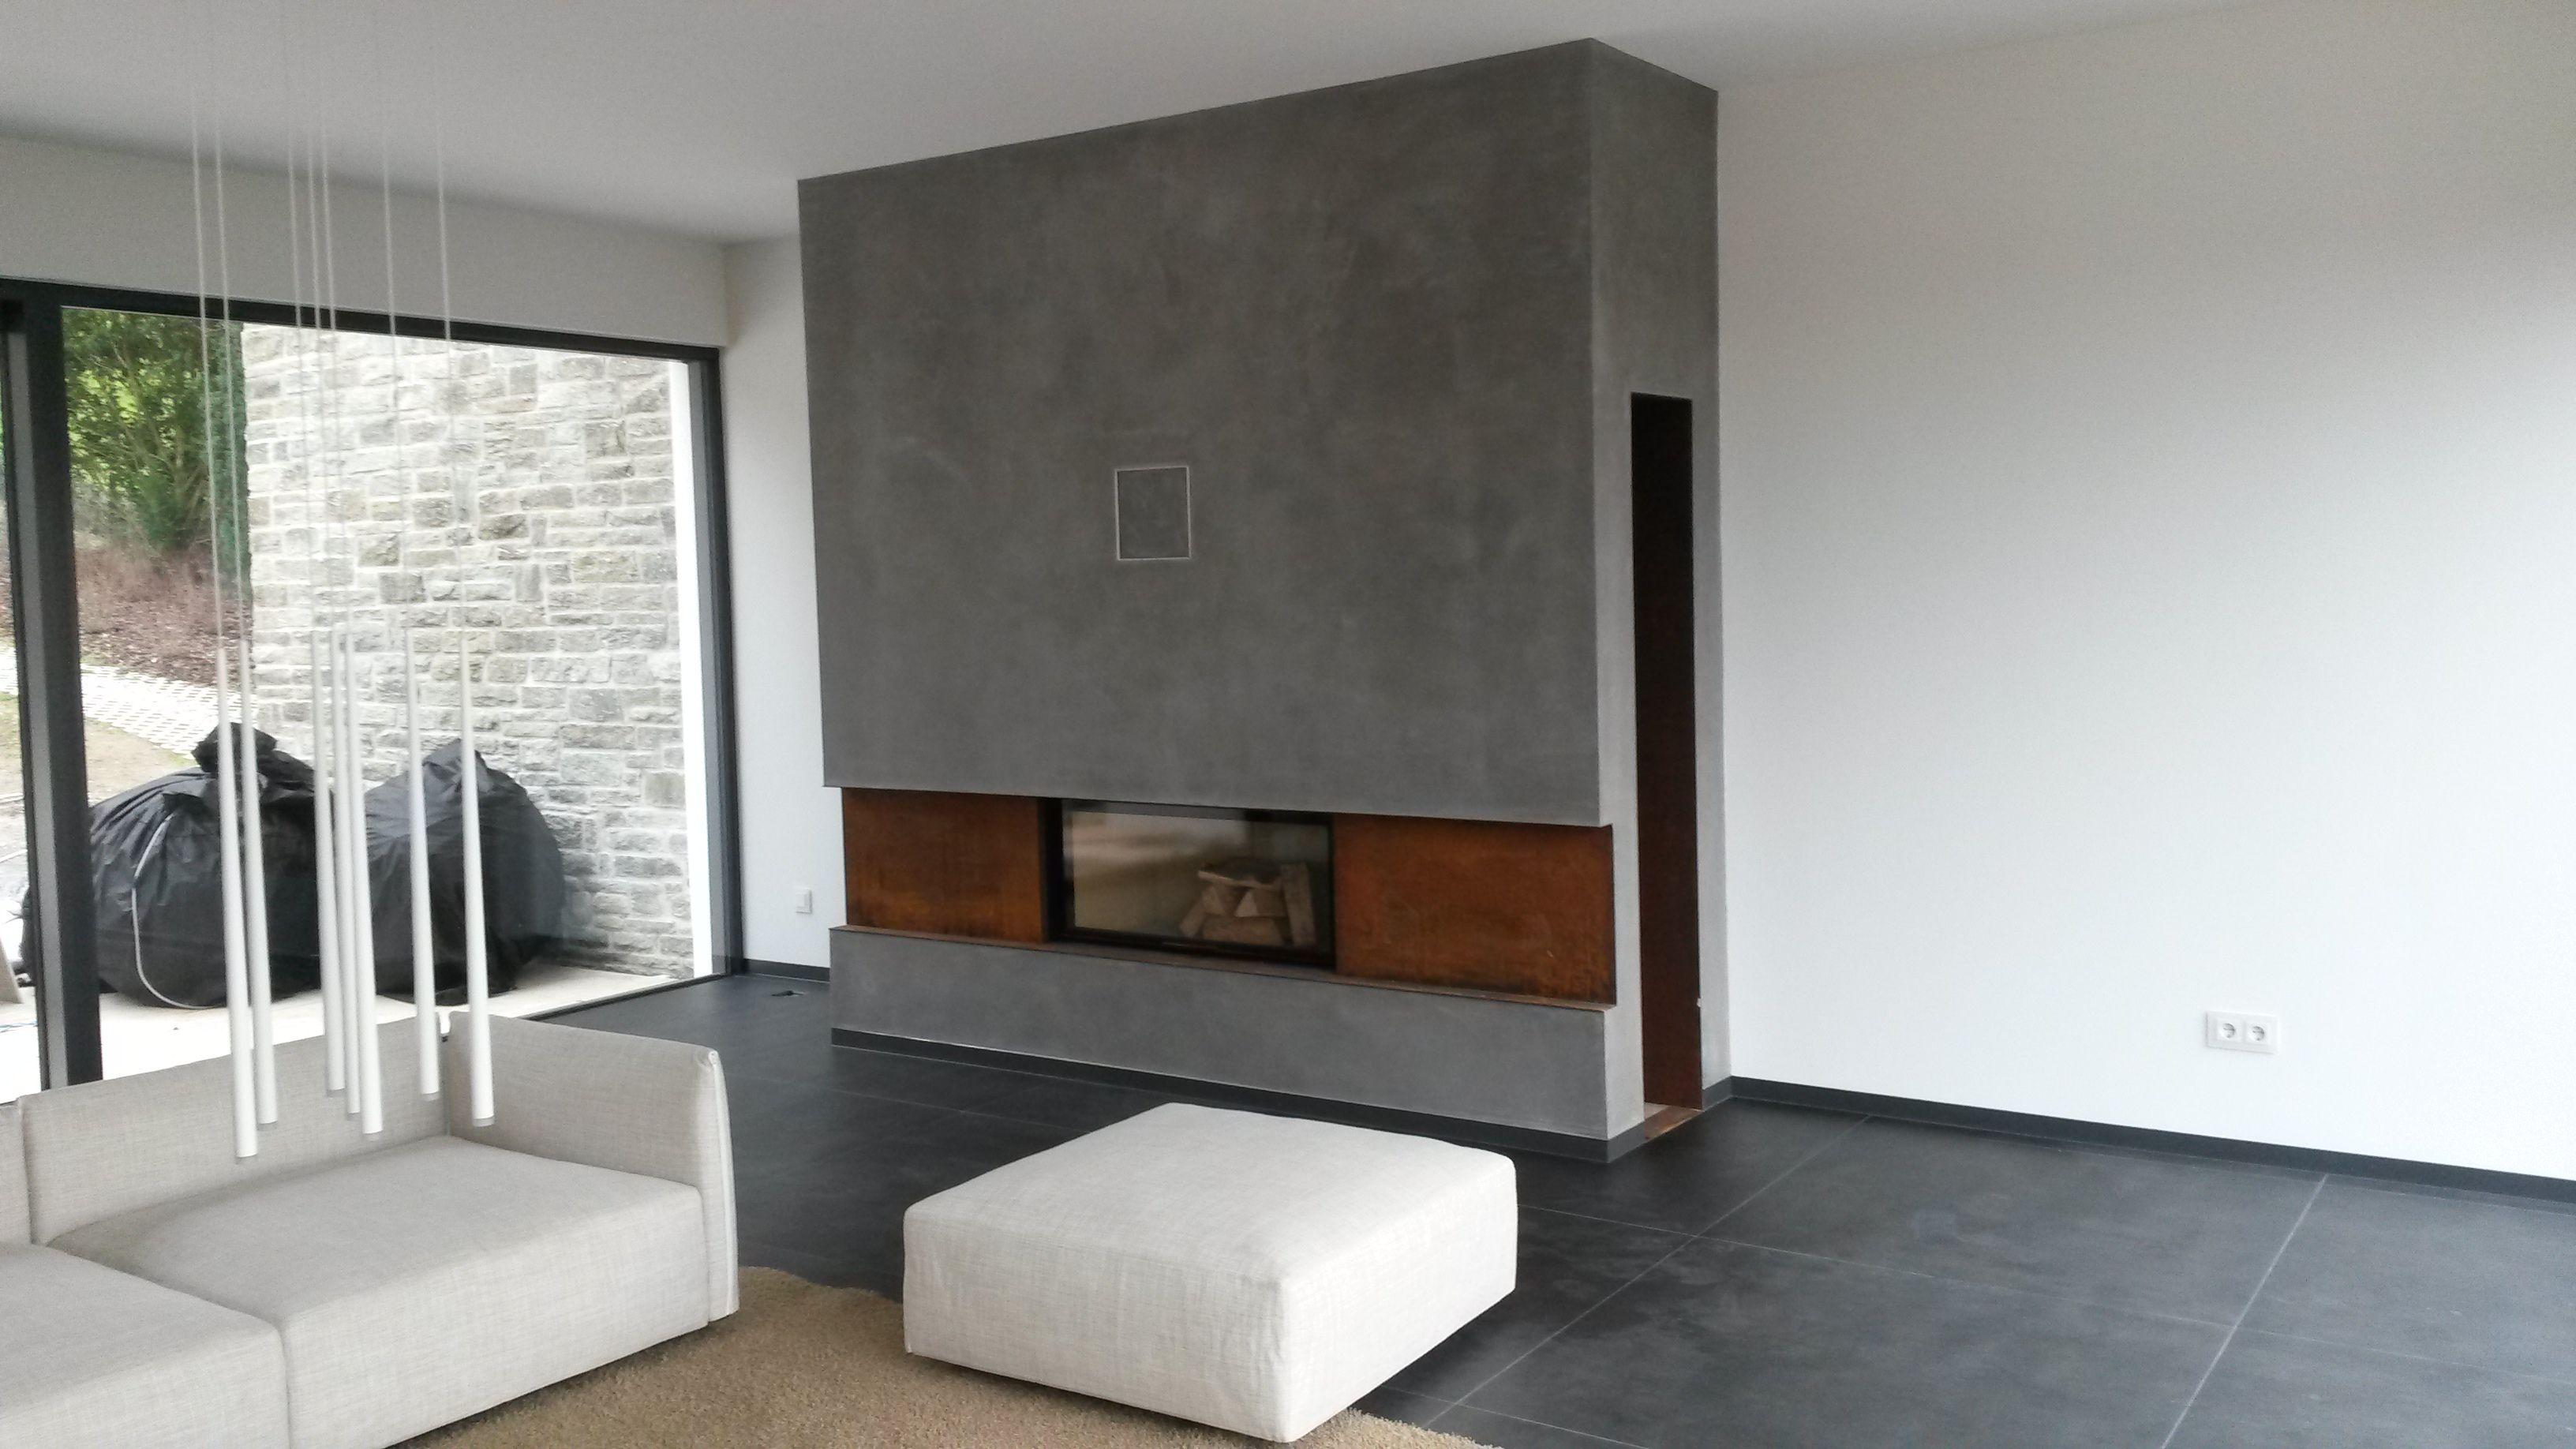 beton kamin rost cortenstahl industrie betonoptik. Black Bedroom Furniture Sets. Home Design Ideas